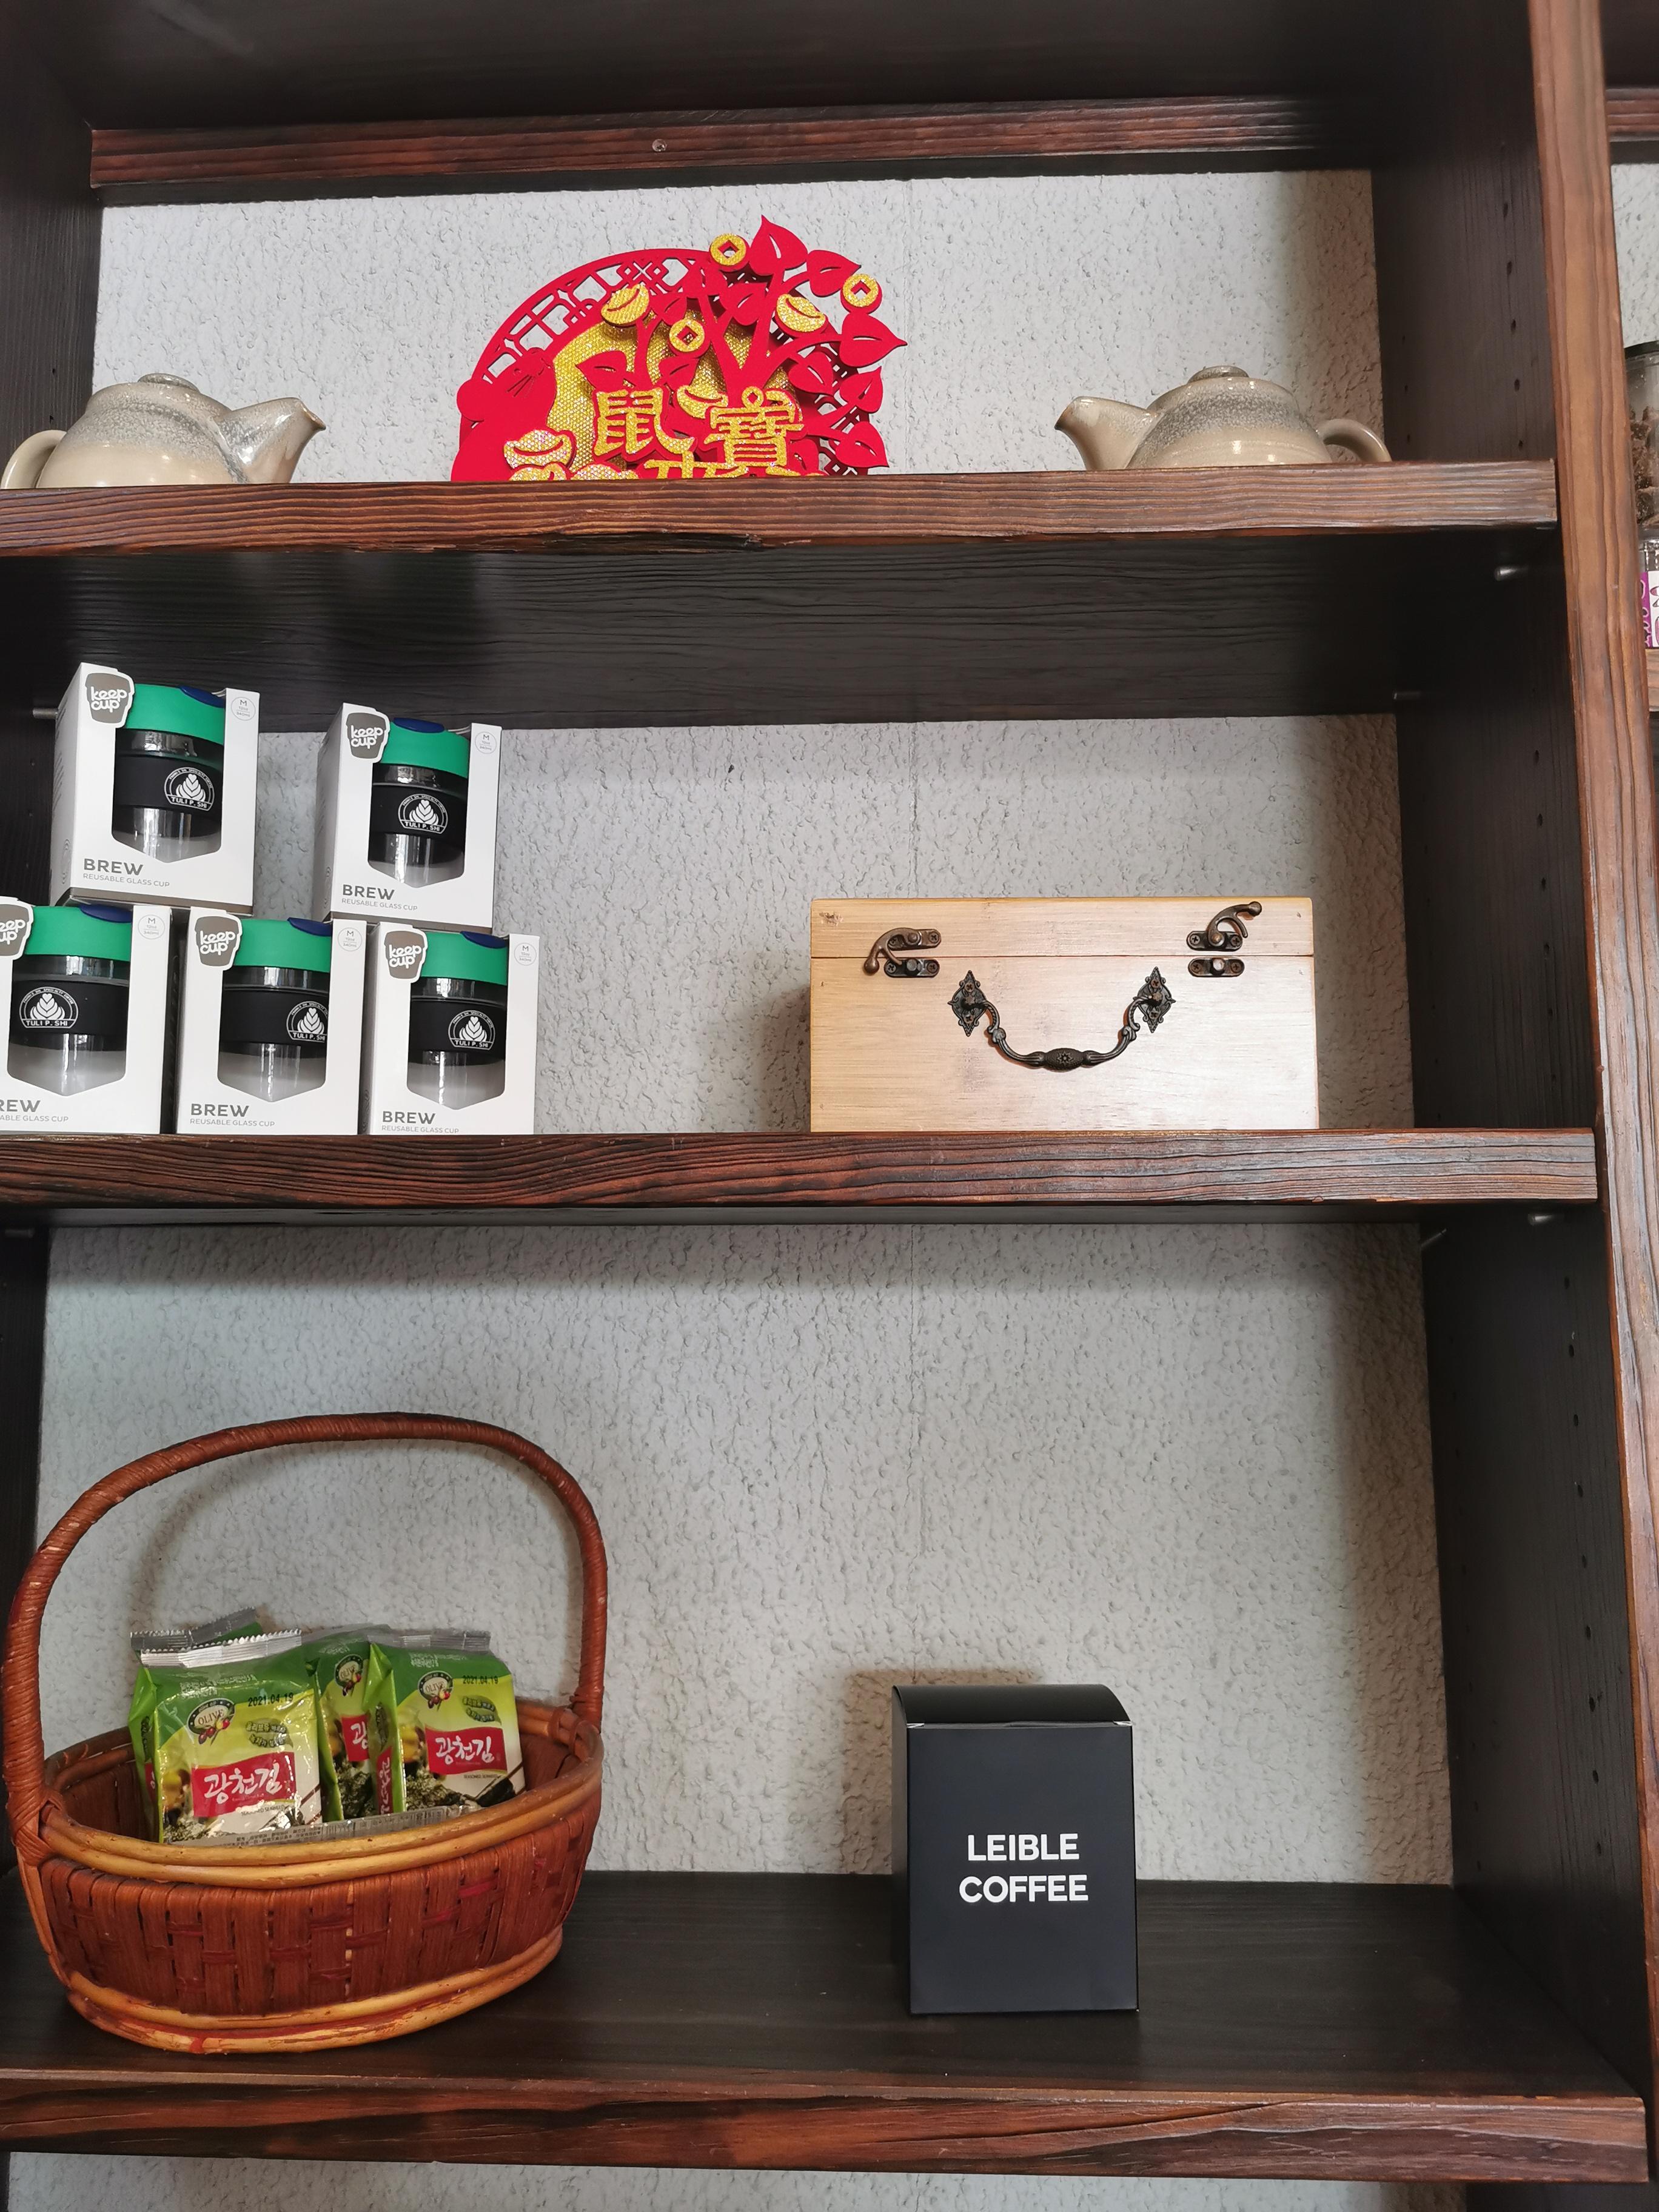 leible coffee -nan tien temple